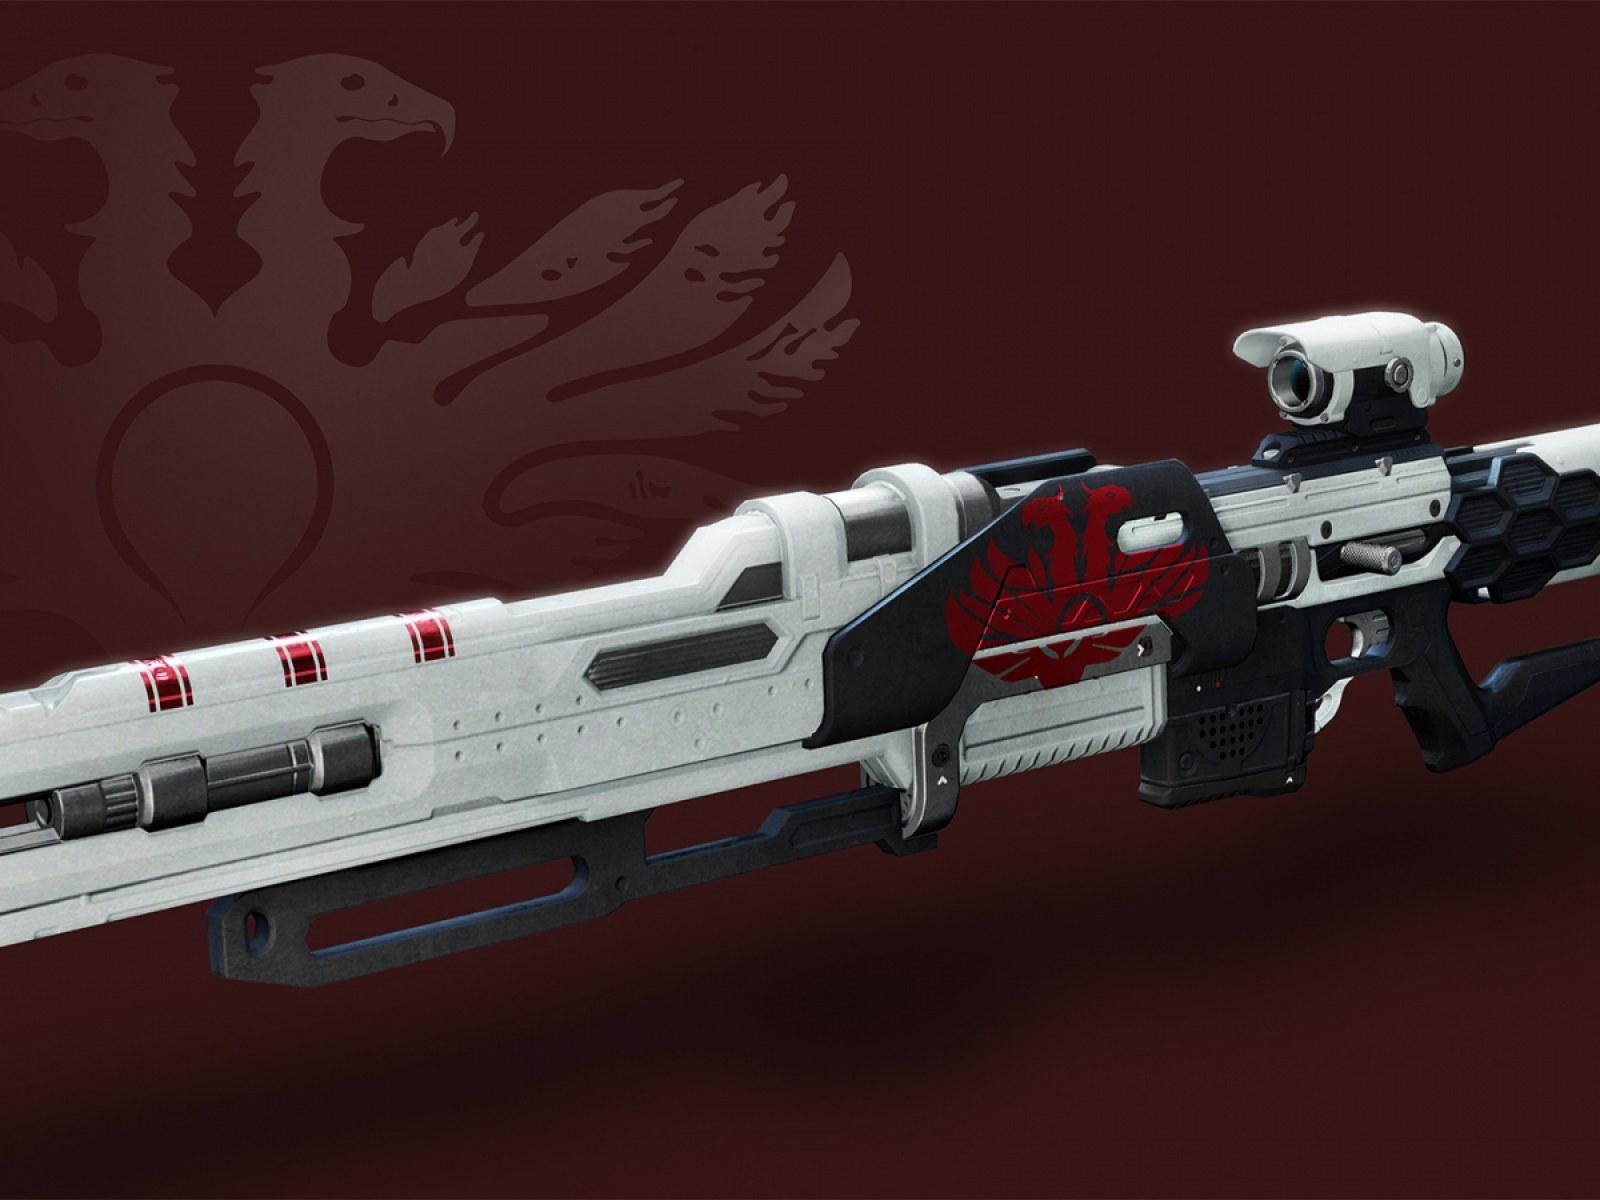 Destiny 2' Season of Opulence Guide: Chalice, Rune Recipes